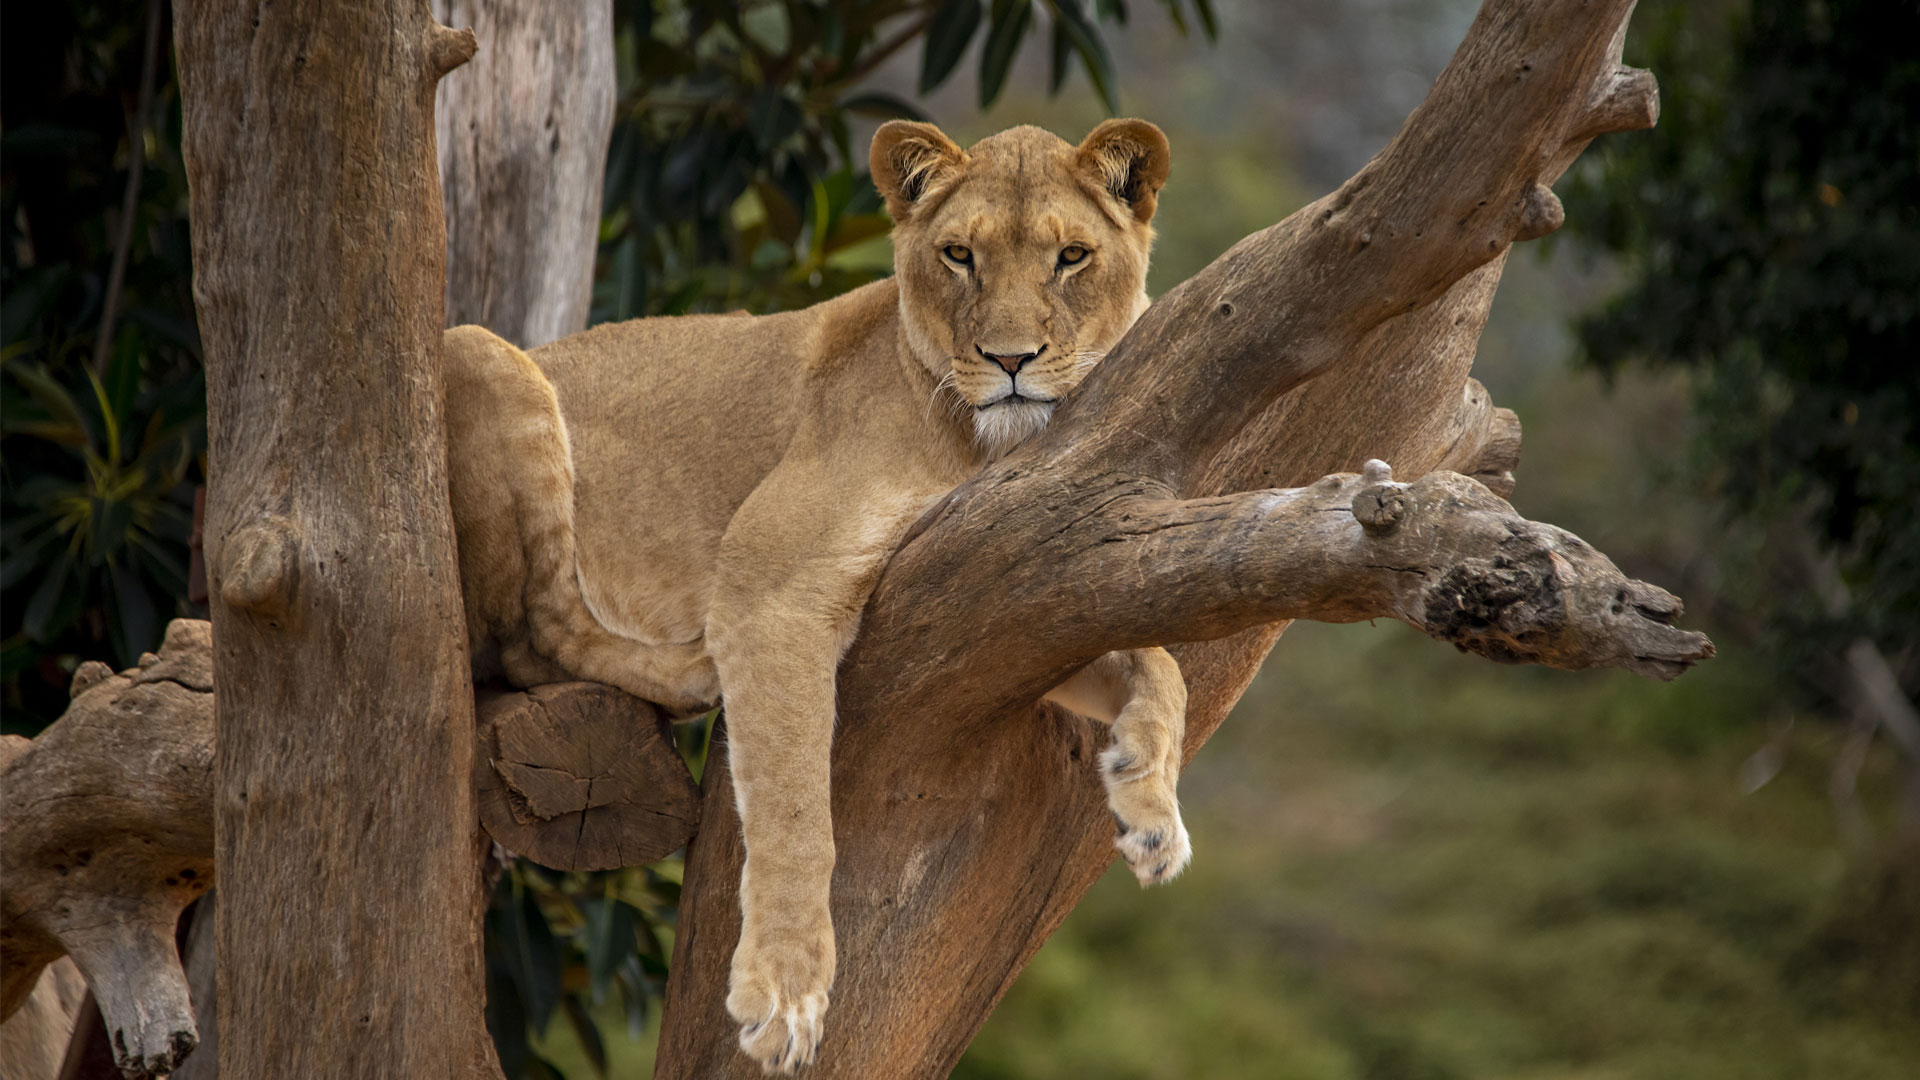 https://rfacdn.nz/zoo/assets/media/lioness-kibibi-gallery-1.jpg